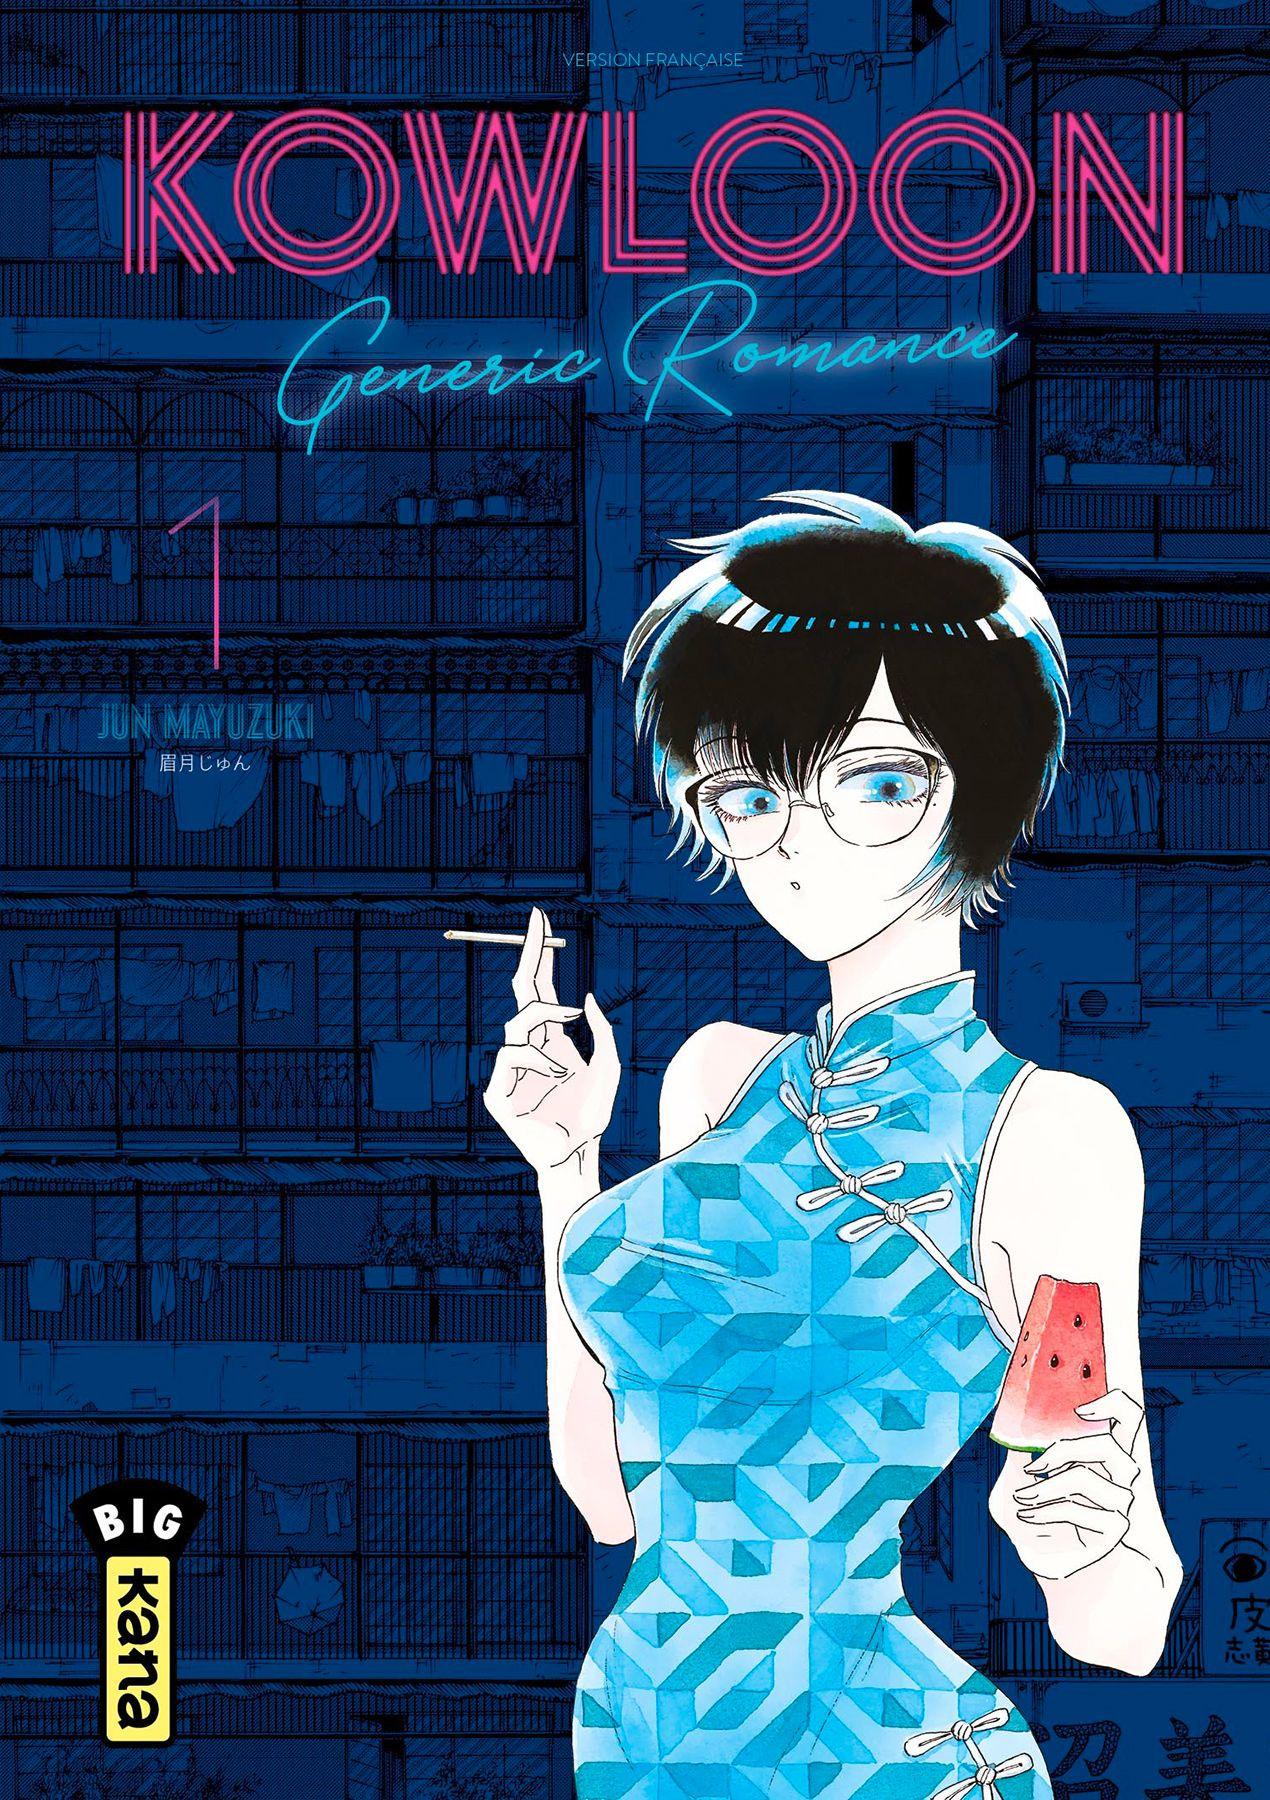 Sortie Manga au Québec JUILLET 2021 Kowloon_Generic_Romance-1-kana